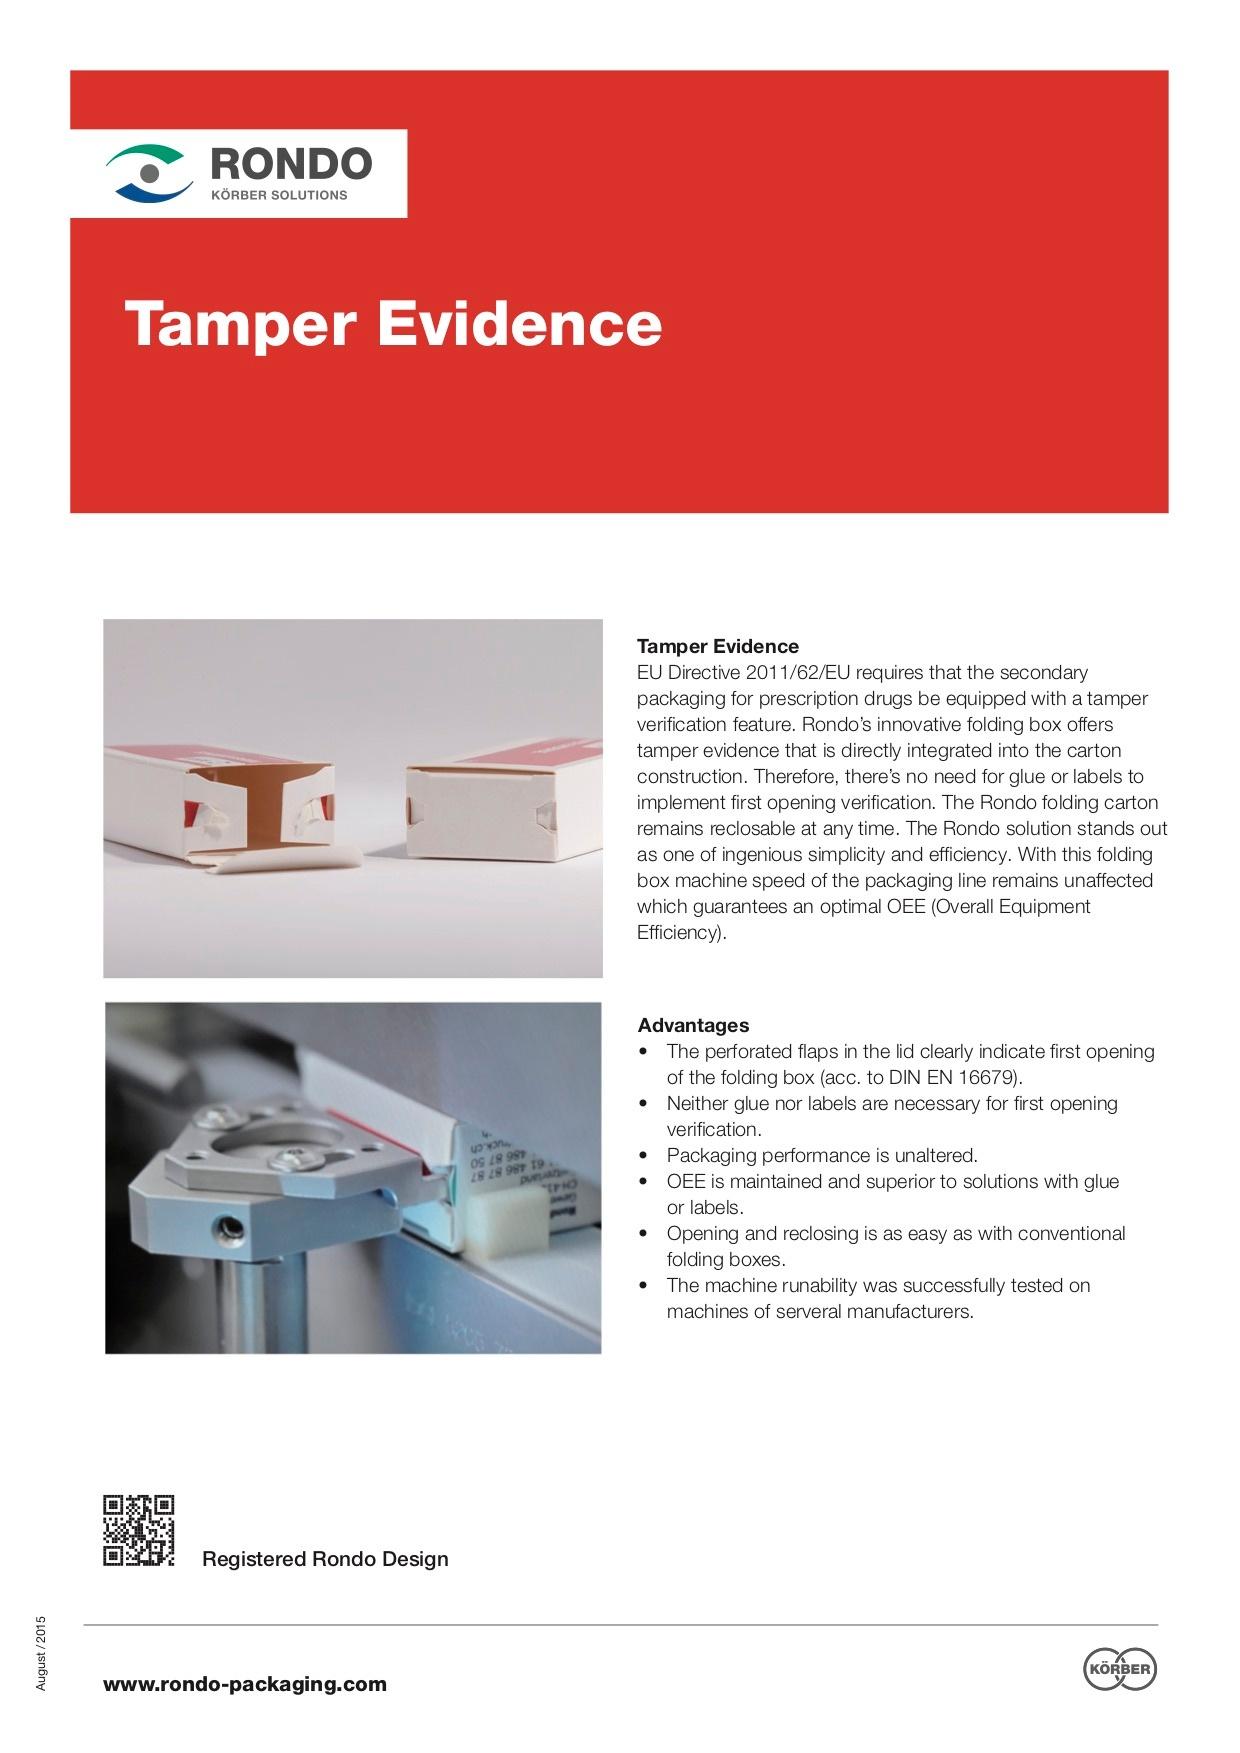 01_Rondo_Solutions_Tamper_Evidence_2015-08_EN